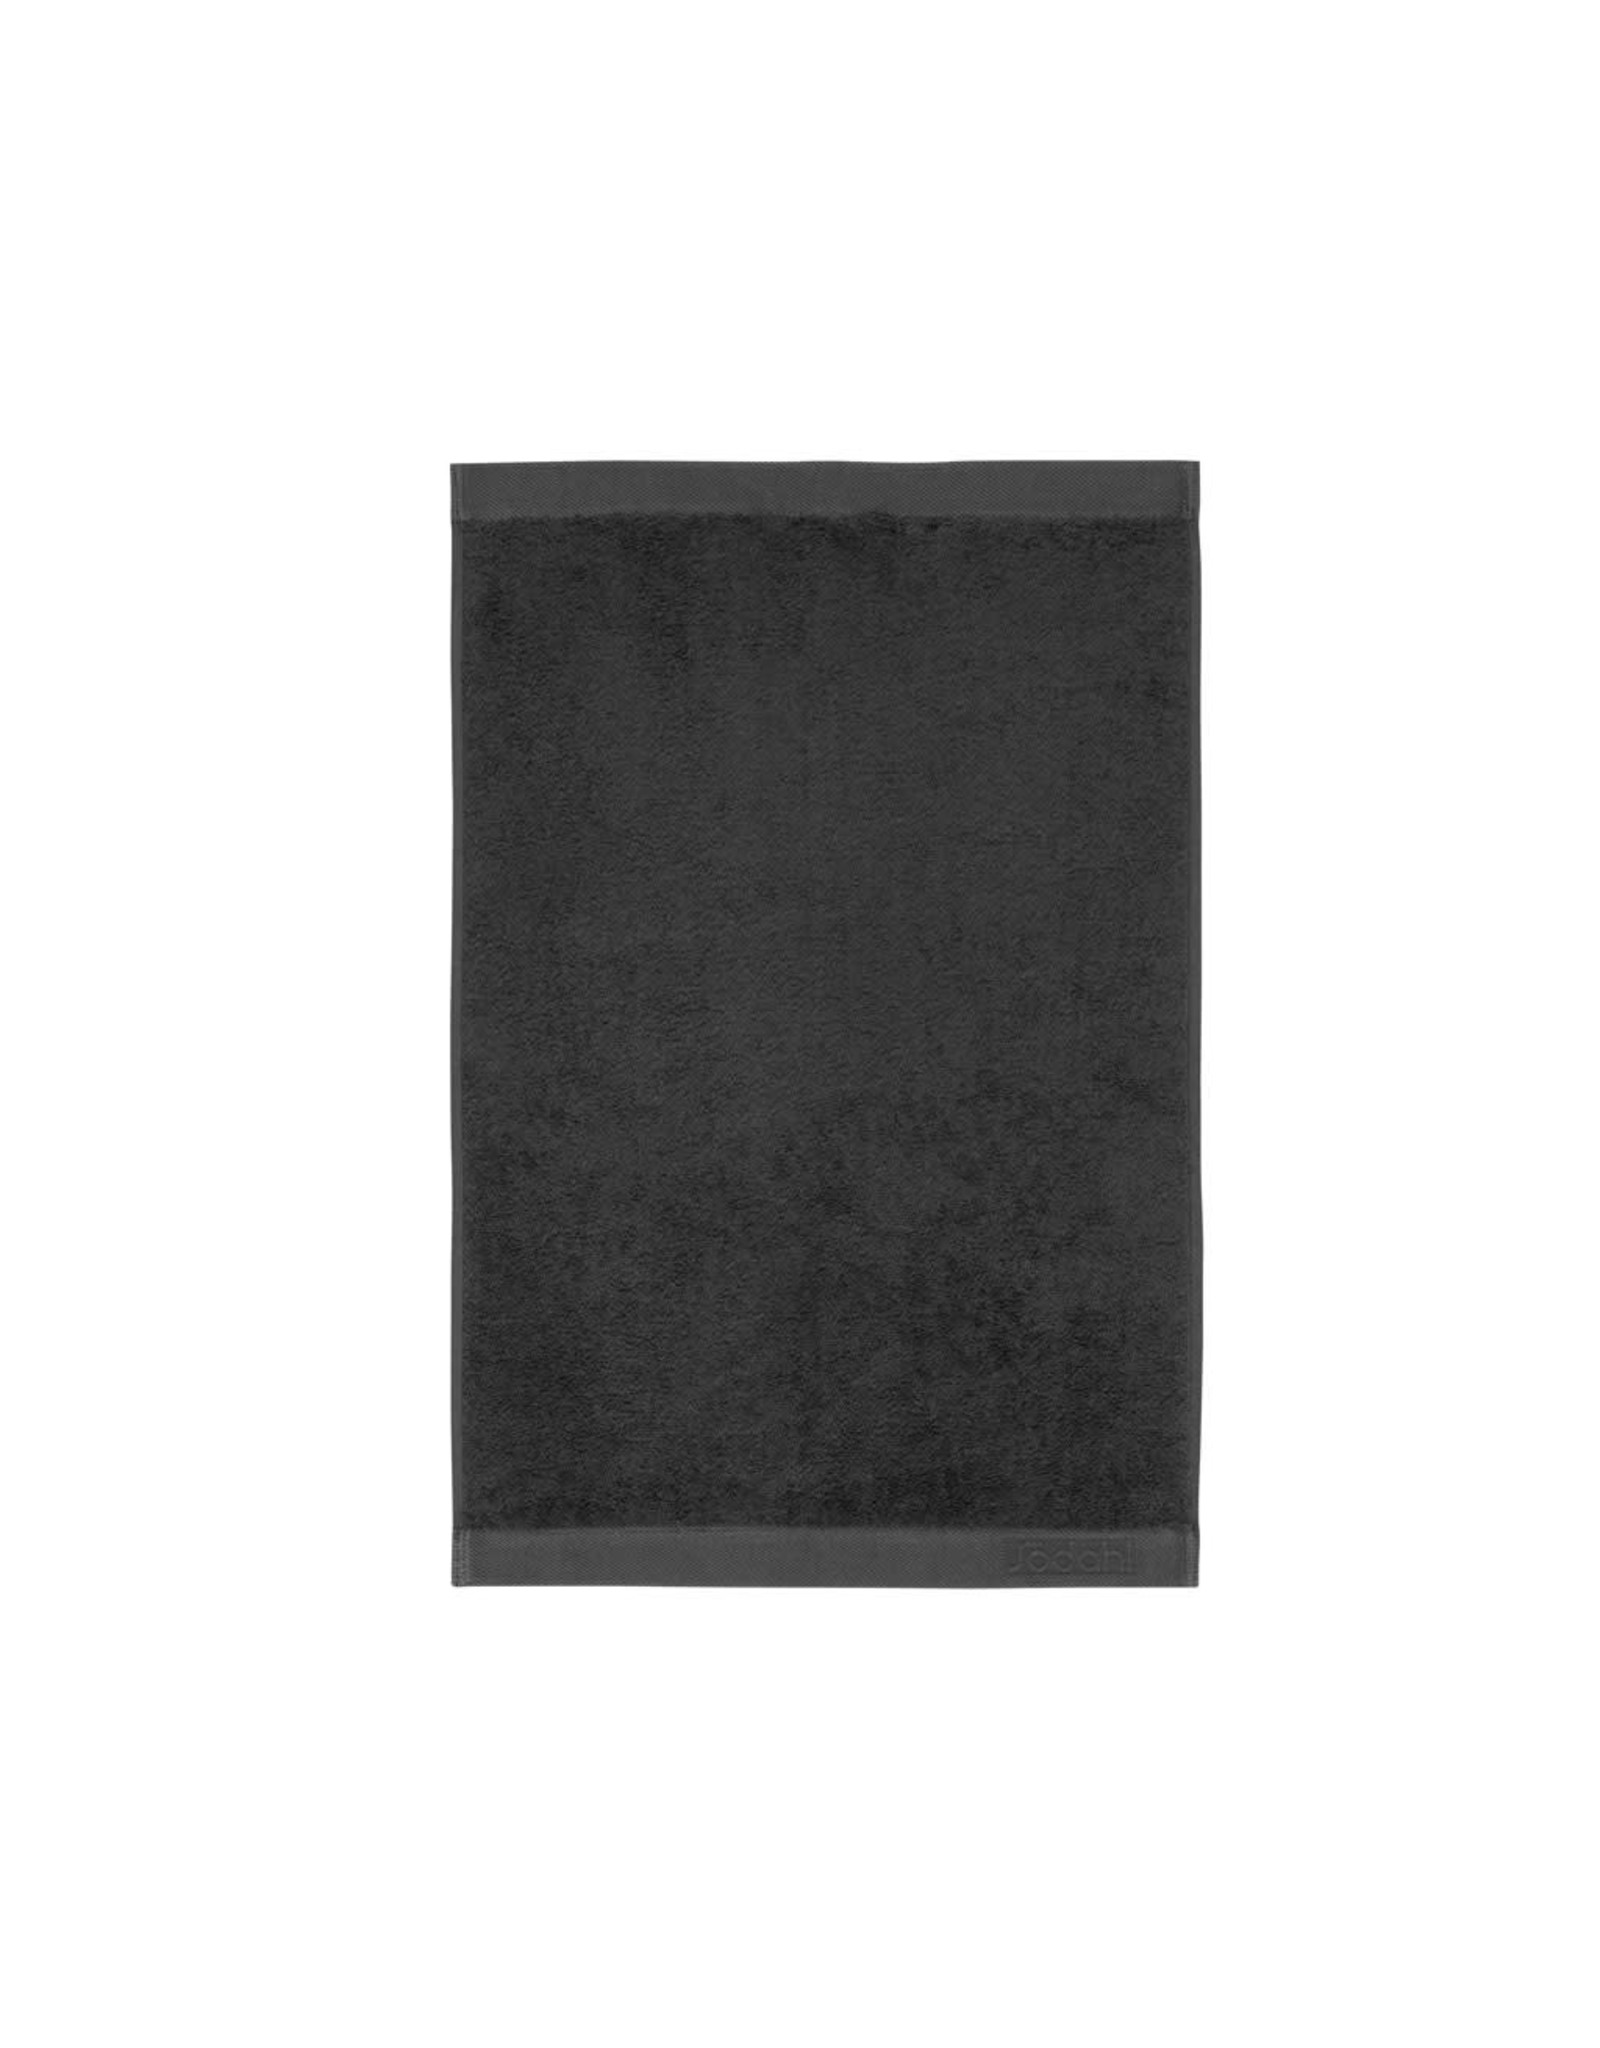 SODAHL SODAHL 727550 HANDDOEK 40X60CM COMFORT BLACK